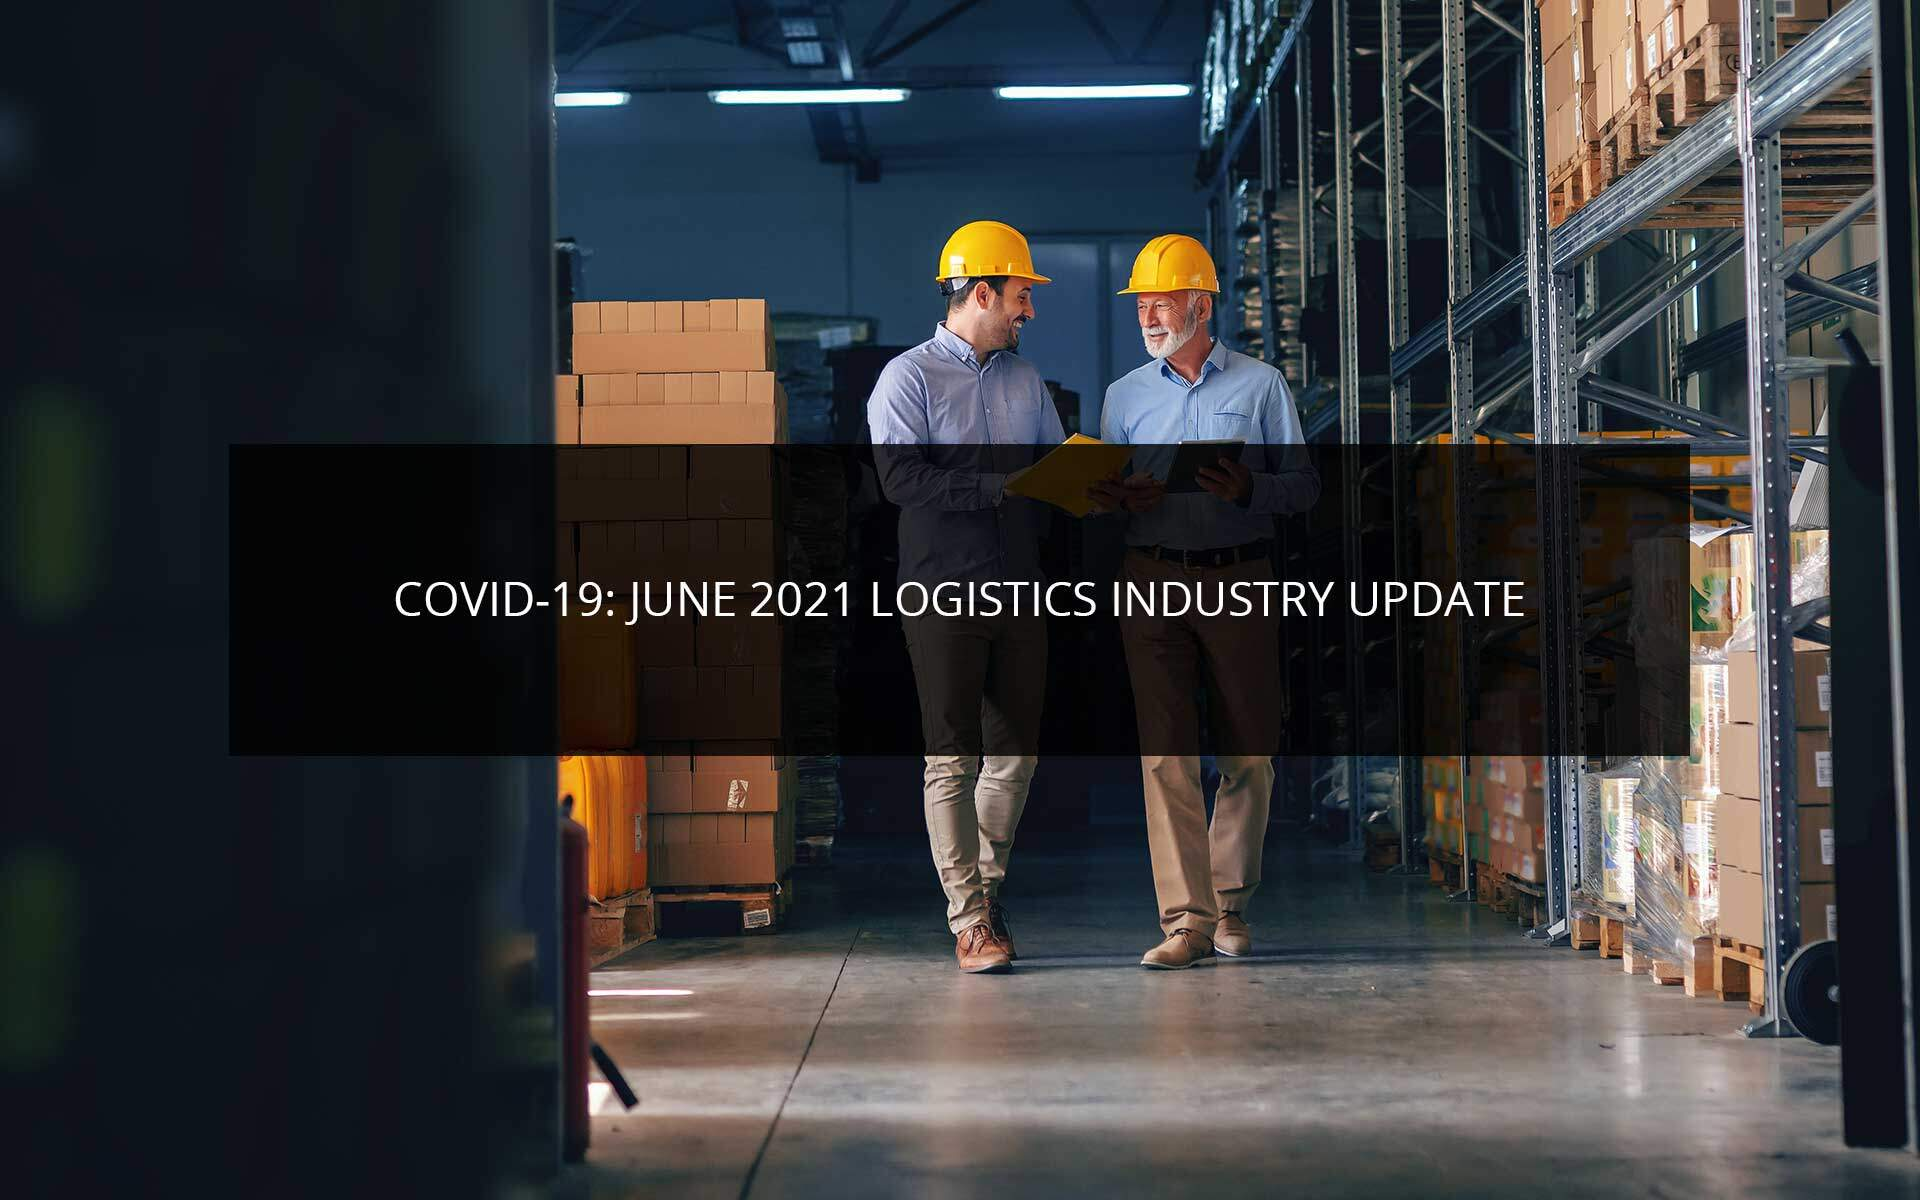 COVID-19: June 2021 Logistics Industry Update